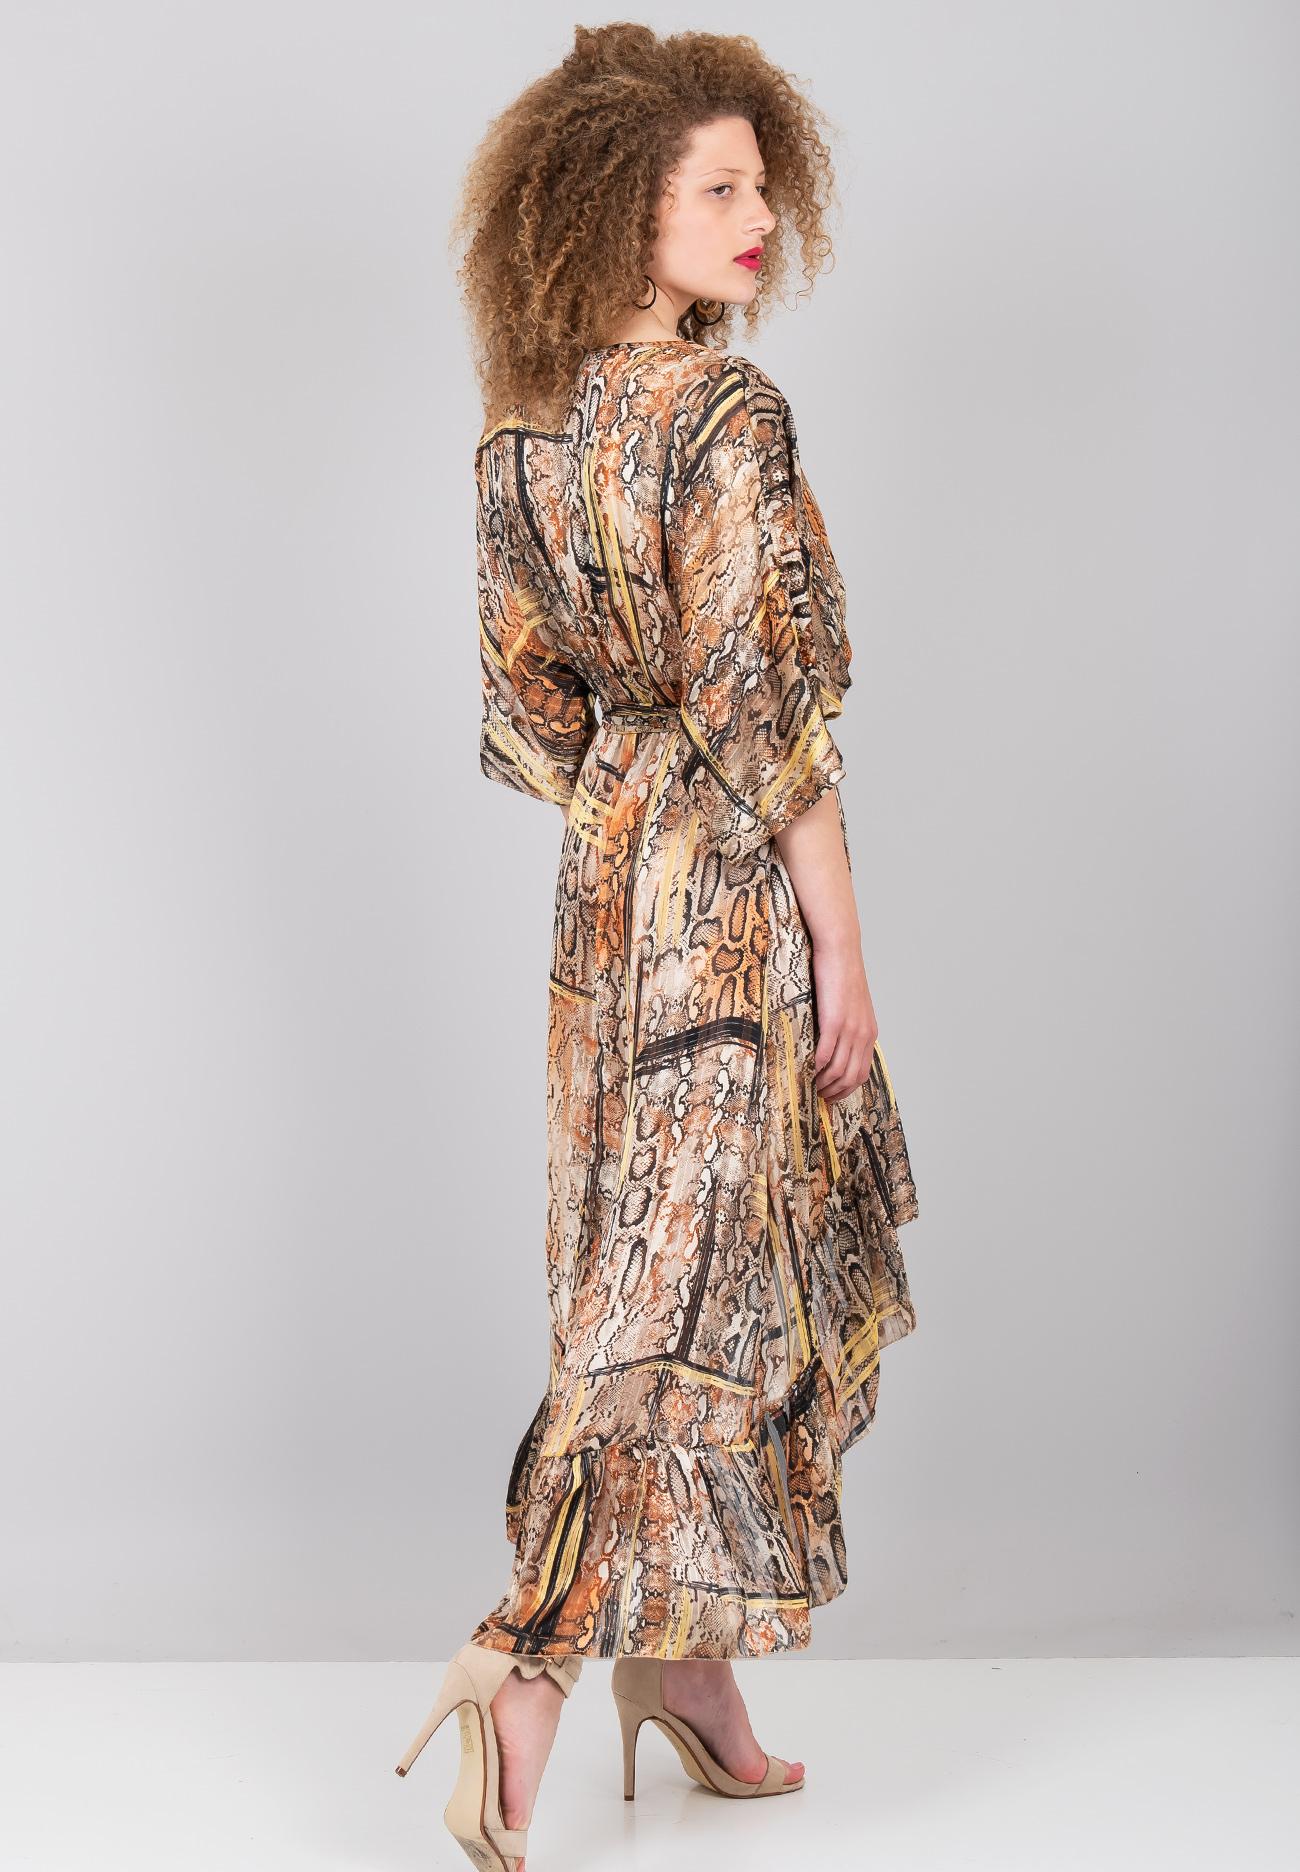 9faa1600559e Ασύμμετρο κρουαζέ φόρεμα με τύπωμα φίδι - ZIC ZAC